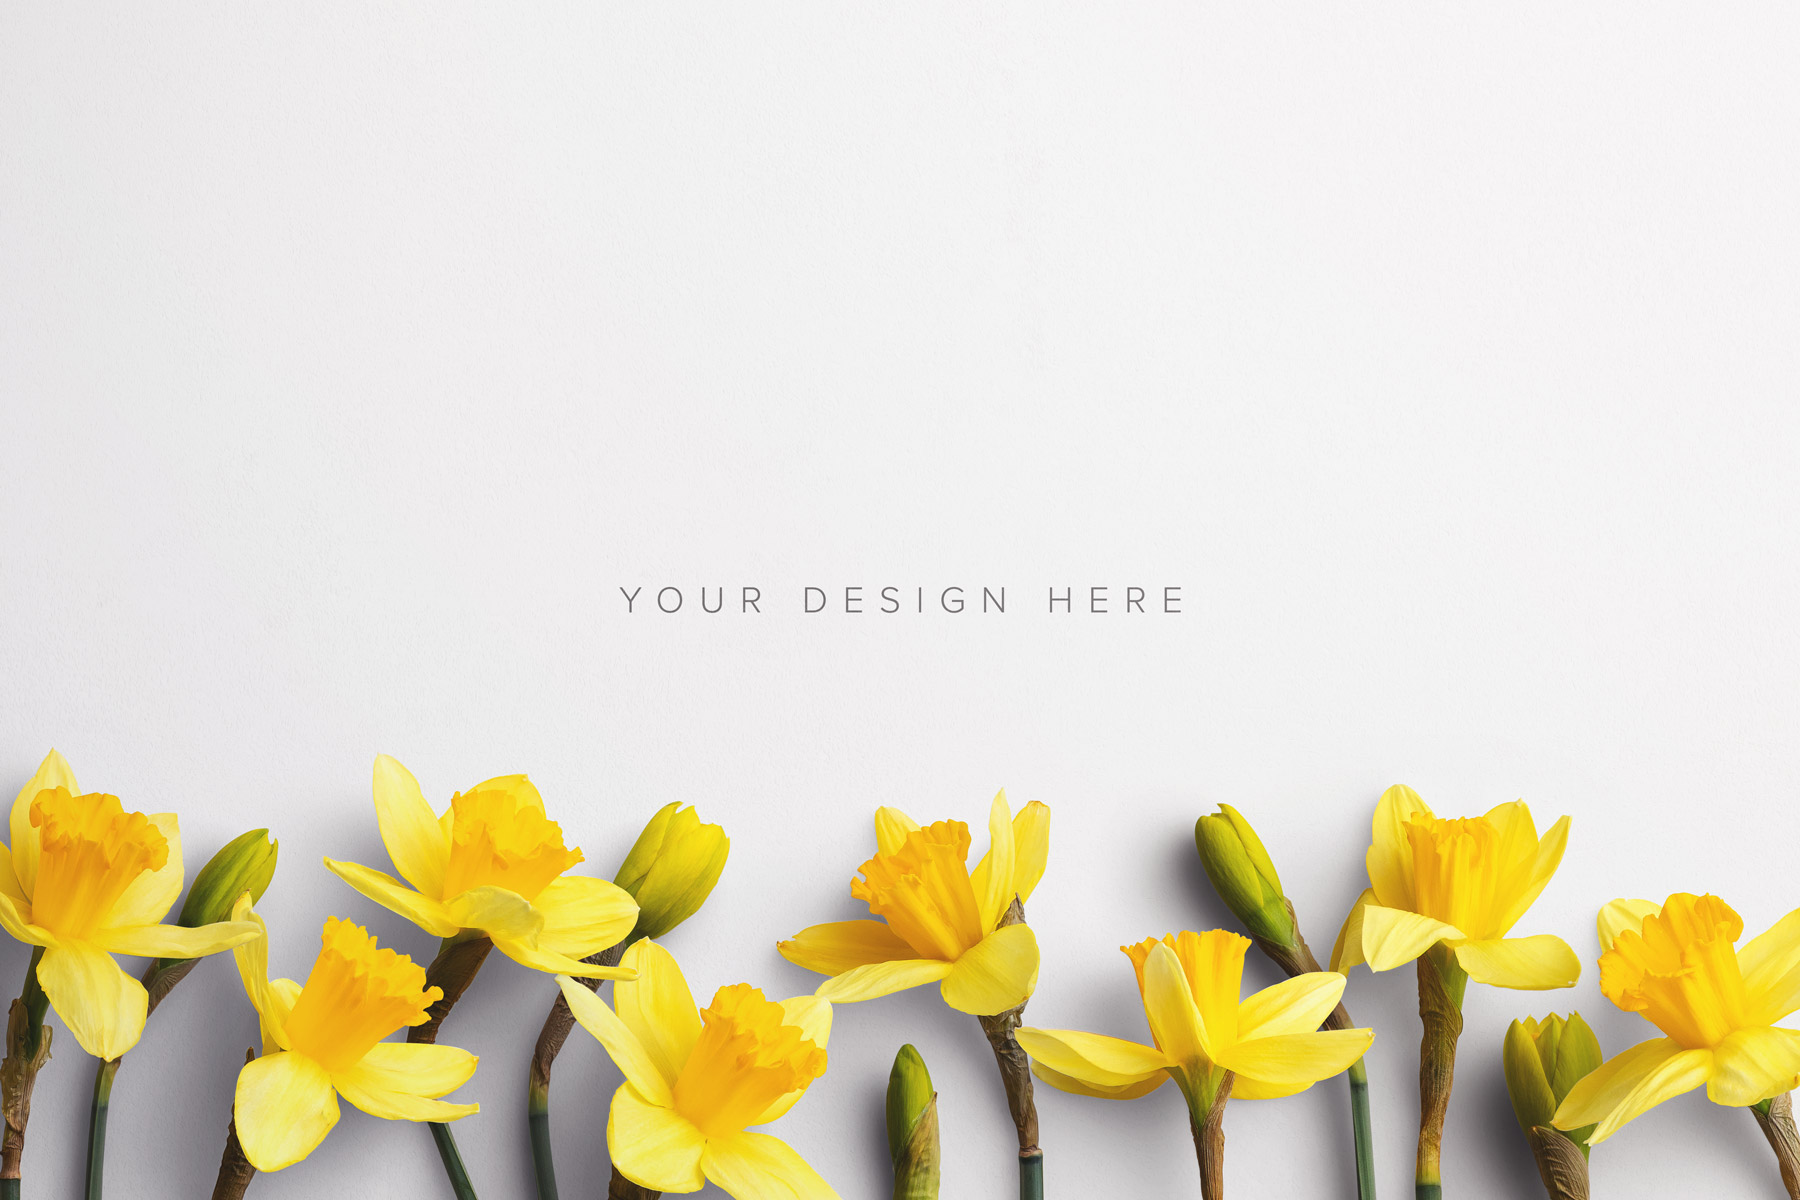 daffodils custom scene creator mockup 2